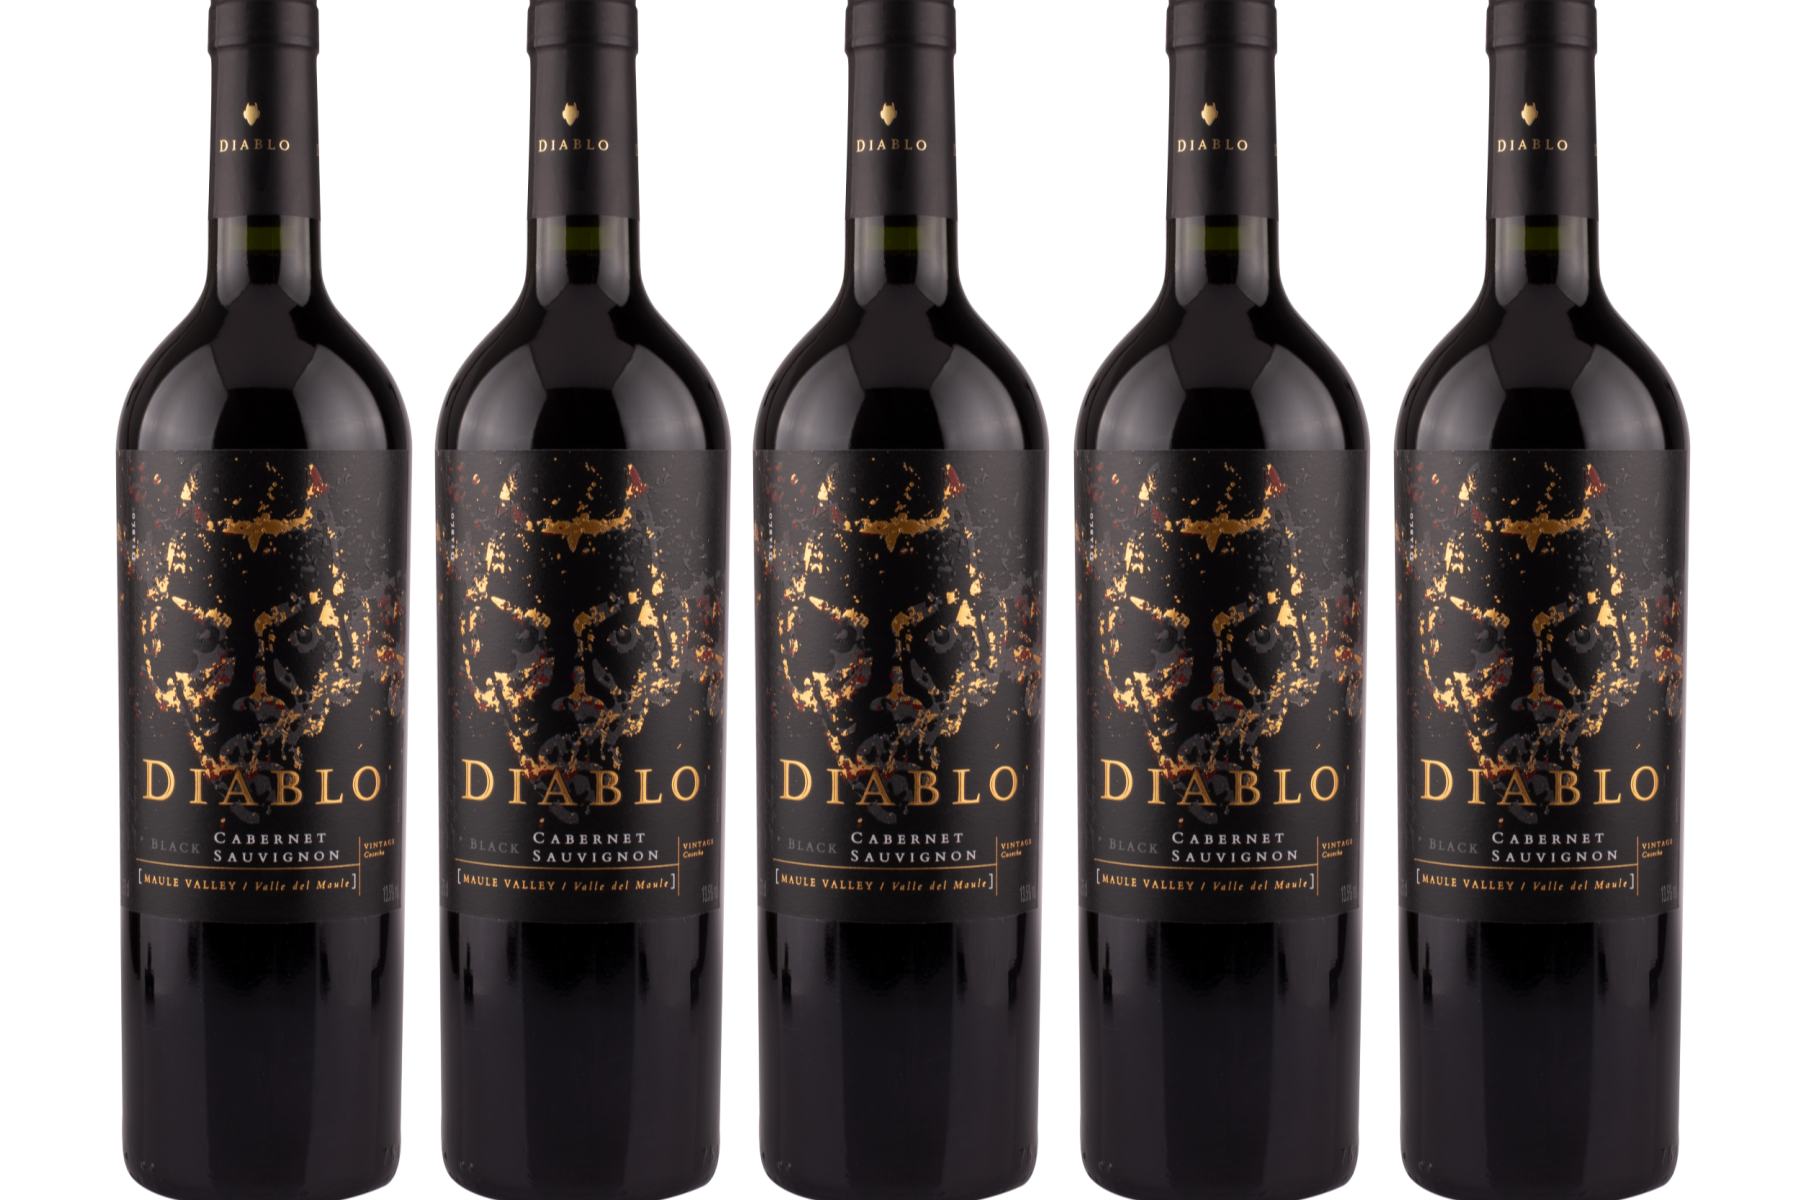 Concha Y Toro Adds Diablo Black Cabernet Sauvignon To Upmarket Wine Range photo